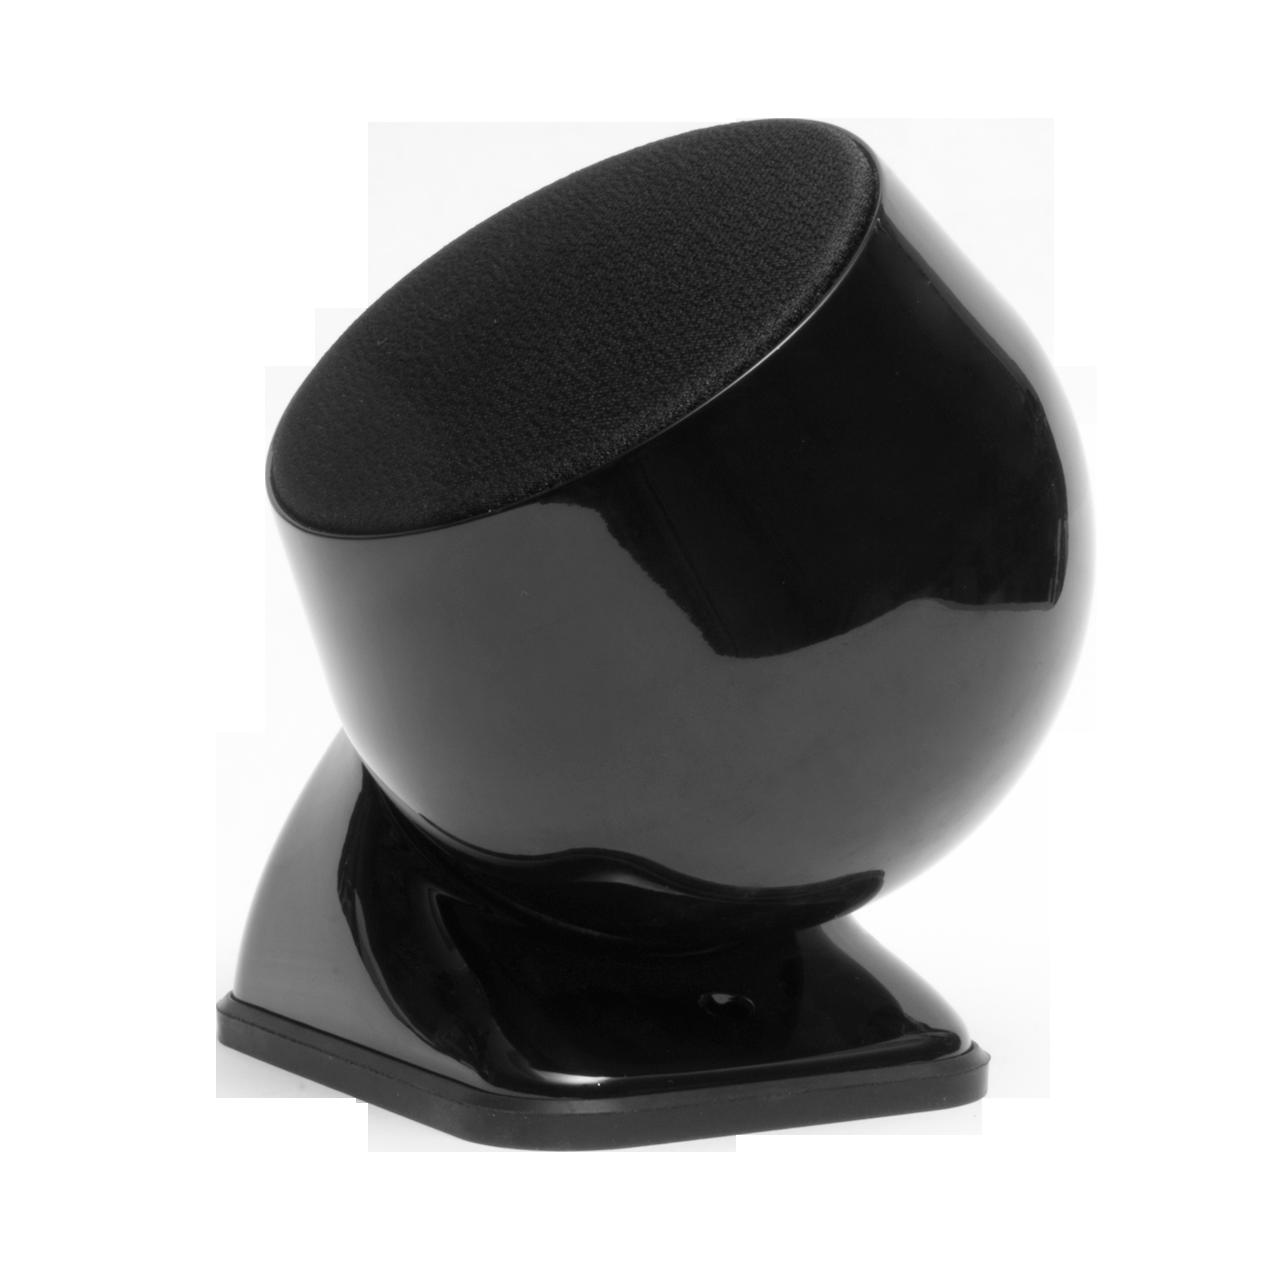 Complete audio versatility with new TruAudio Speakers from Amber International